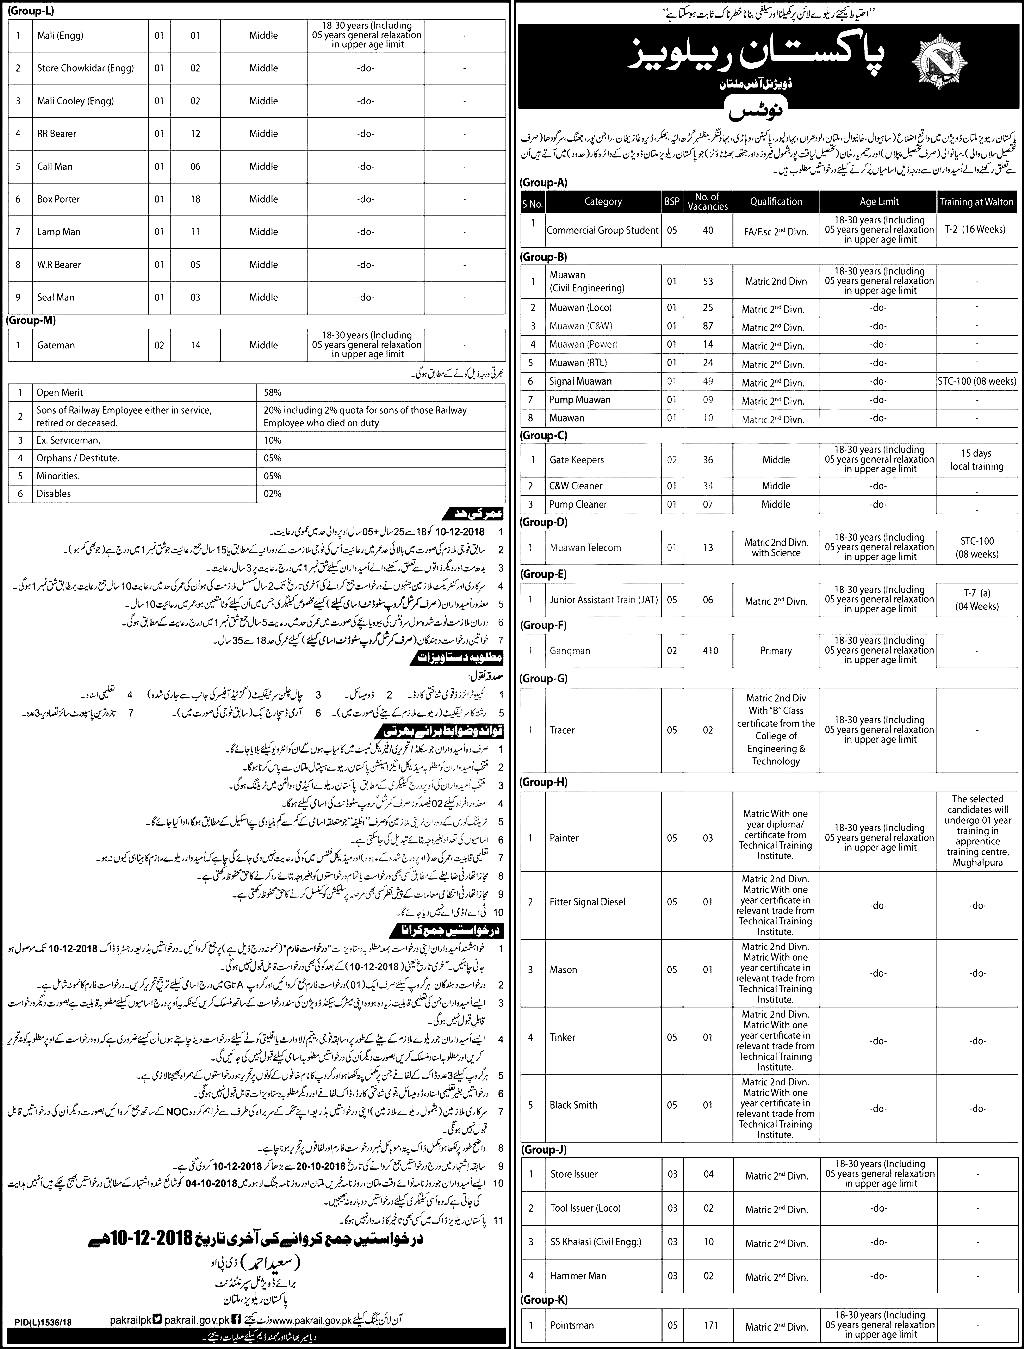 Multan Division Pakistan Railway Jobs 2018 Application Form Download online